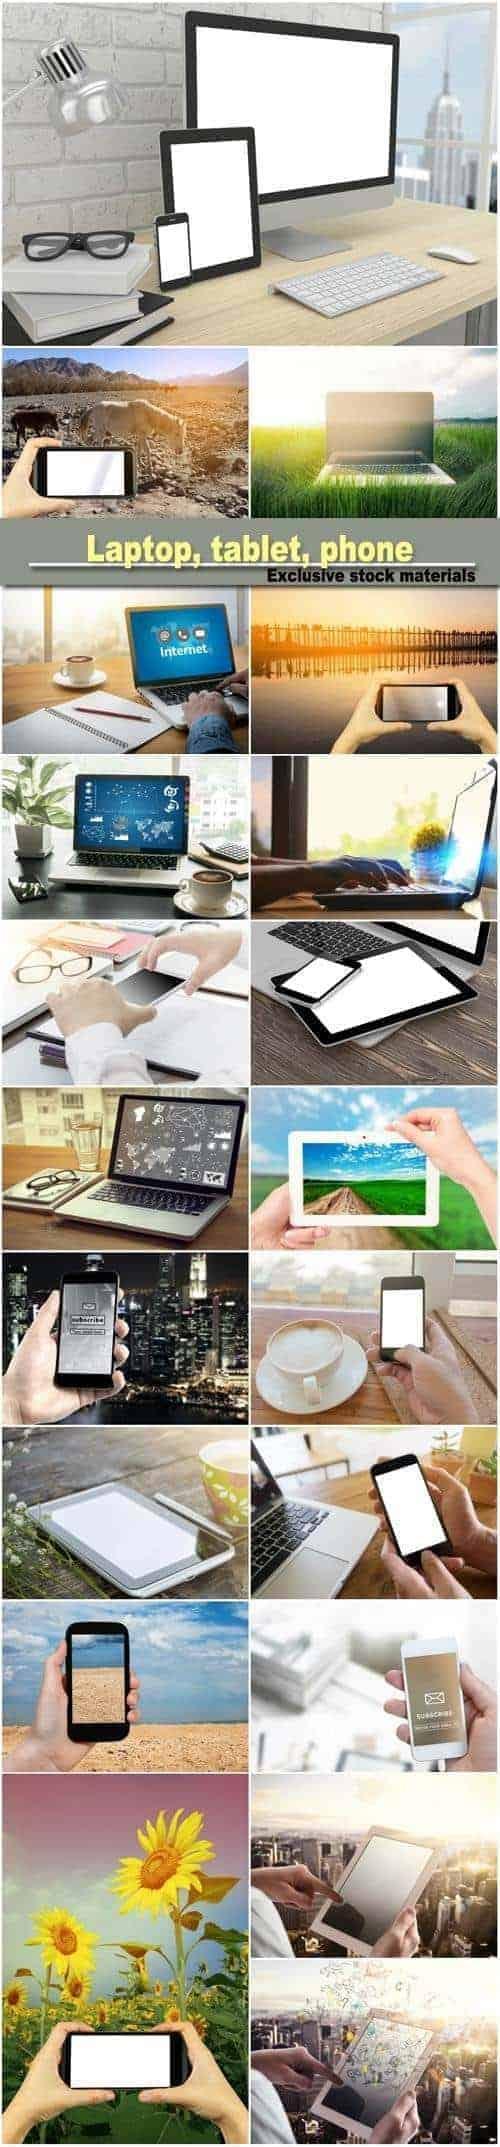 Ноутбук, планшет, телефон на столе в офисе